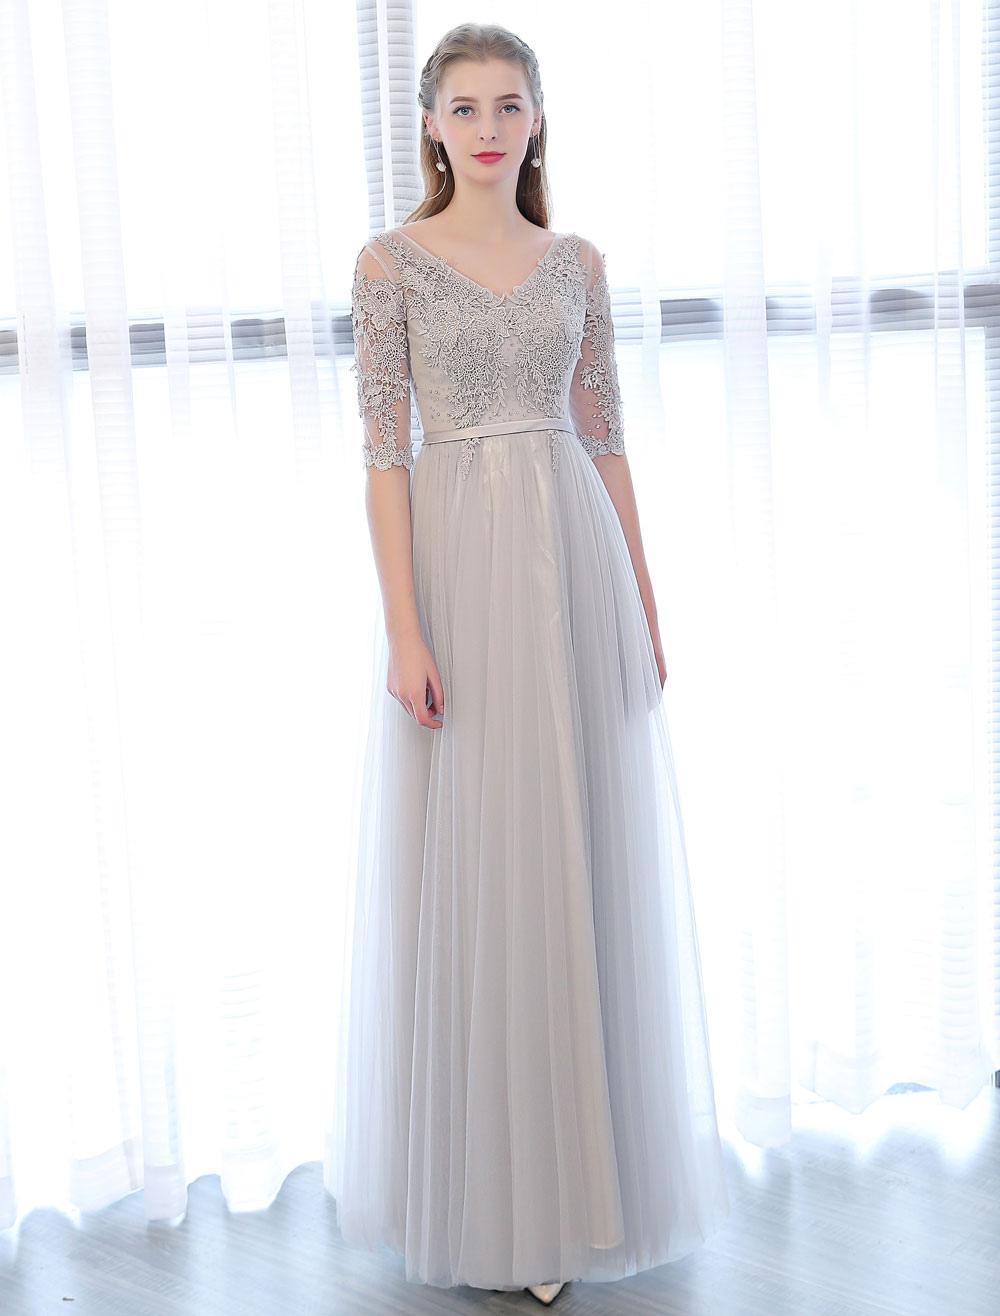 Prom Dresses Long Light Gray V Neck Lace Half Sleeve Beading Sash Floor Length Tulle Formal Party Dress